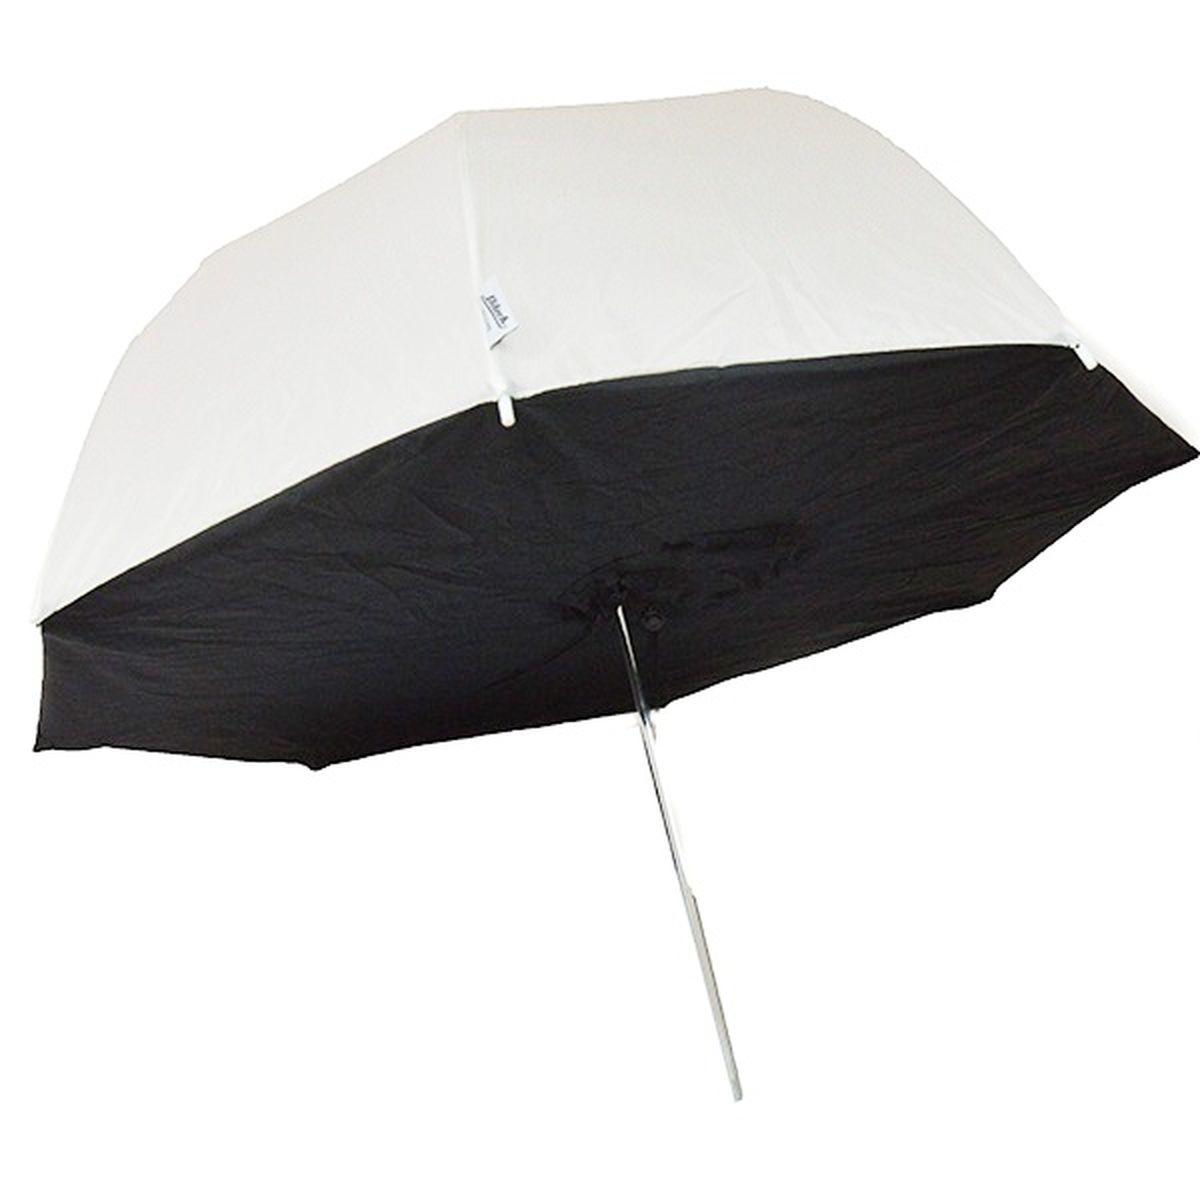 Ditech UBS33WB, White Black зонт-софтбокс для фотосъемки ( UBS33WB )